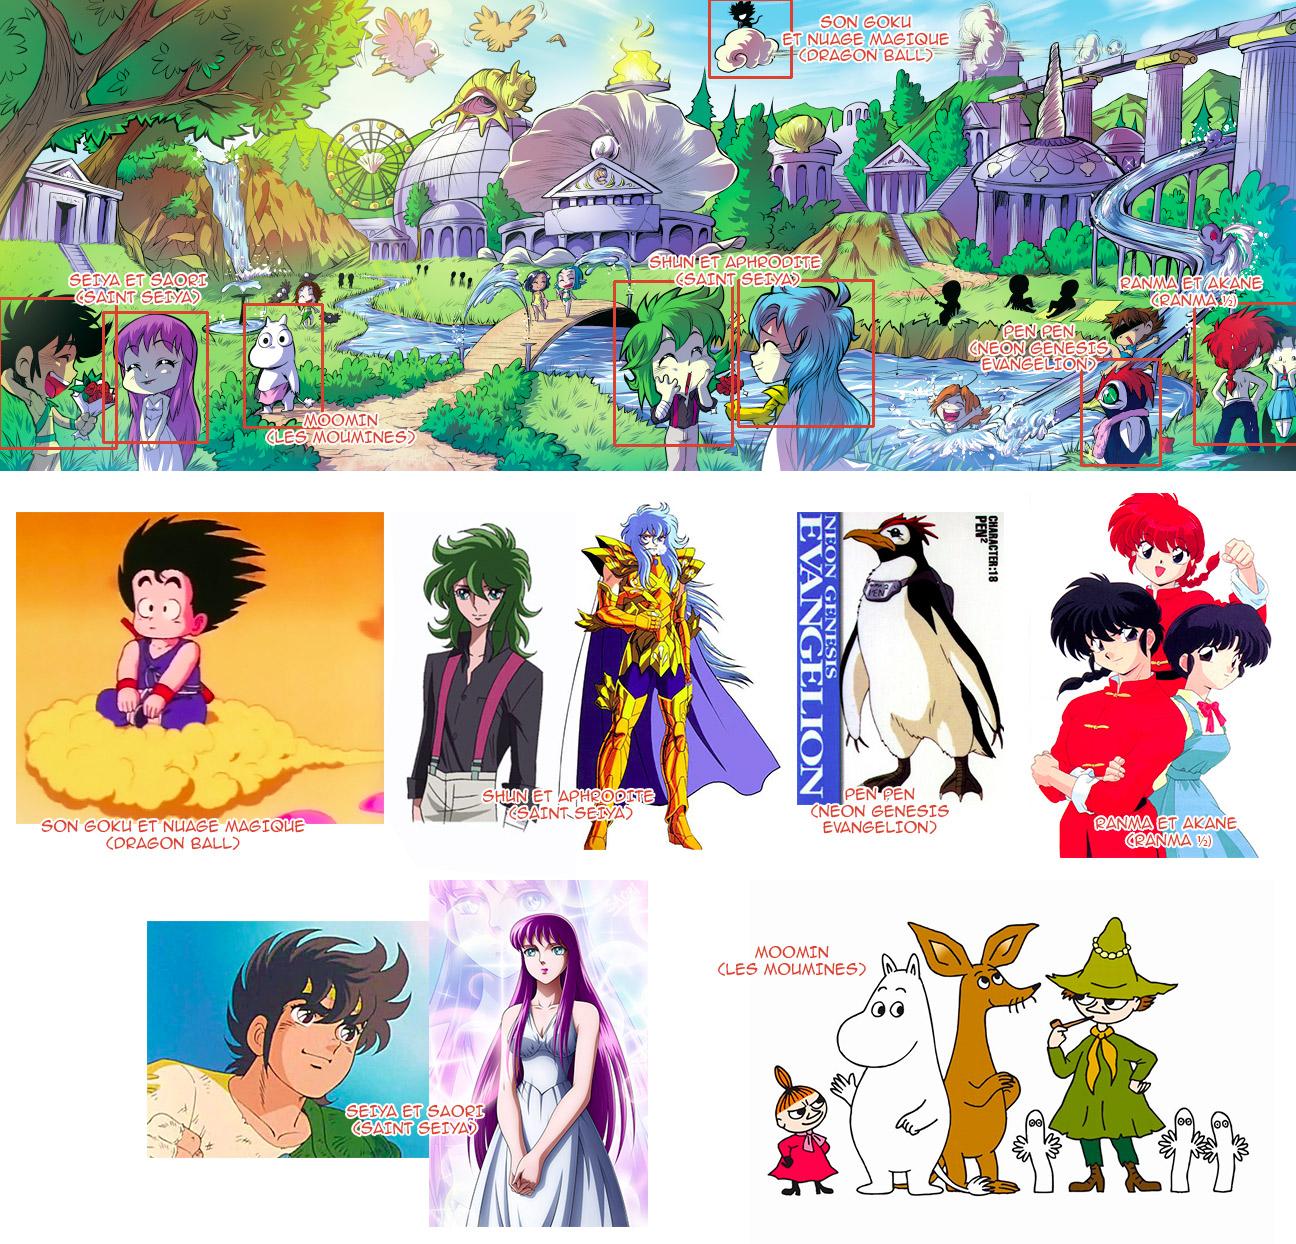 Ranma, Son Goku, Evangelion, Saint Seya - Les légendaires